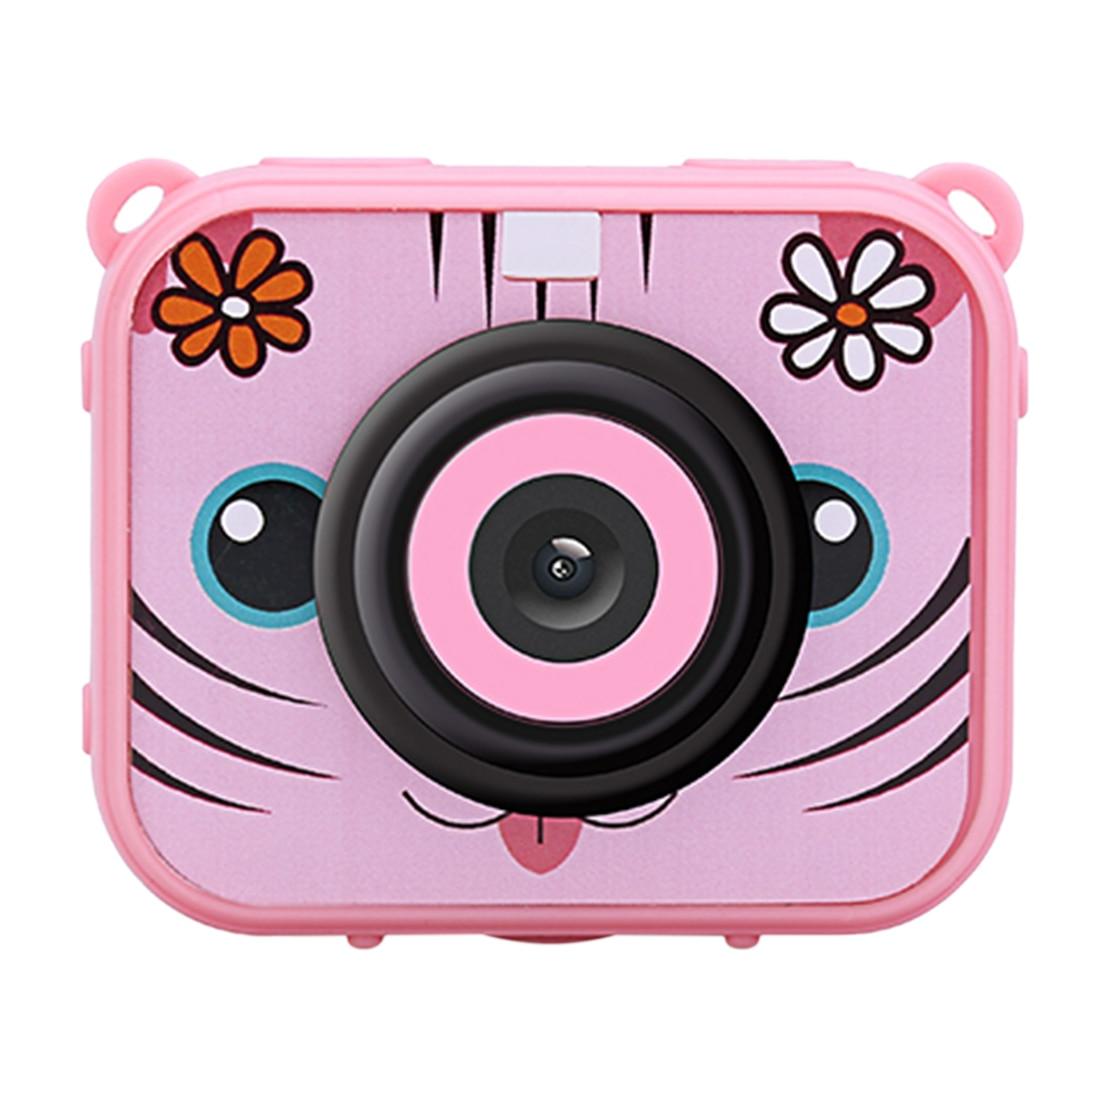 Kid Underwater Action Camera Digital Camera HD 12MP Waterproof Sports Camera For Children Kids Birthday Gift - AT-J20 Pink Blue